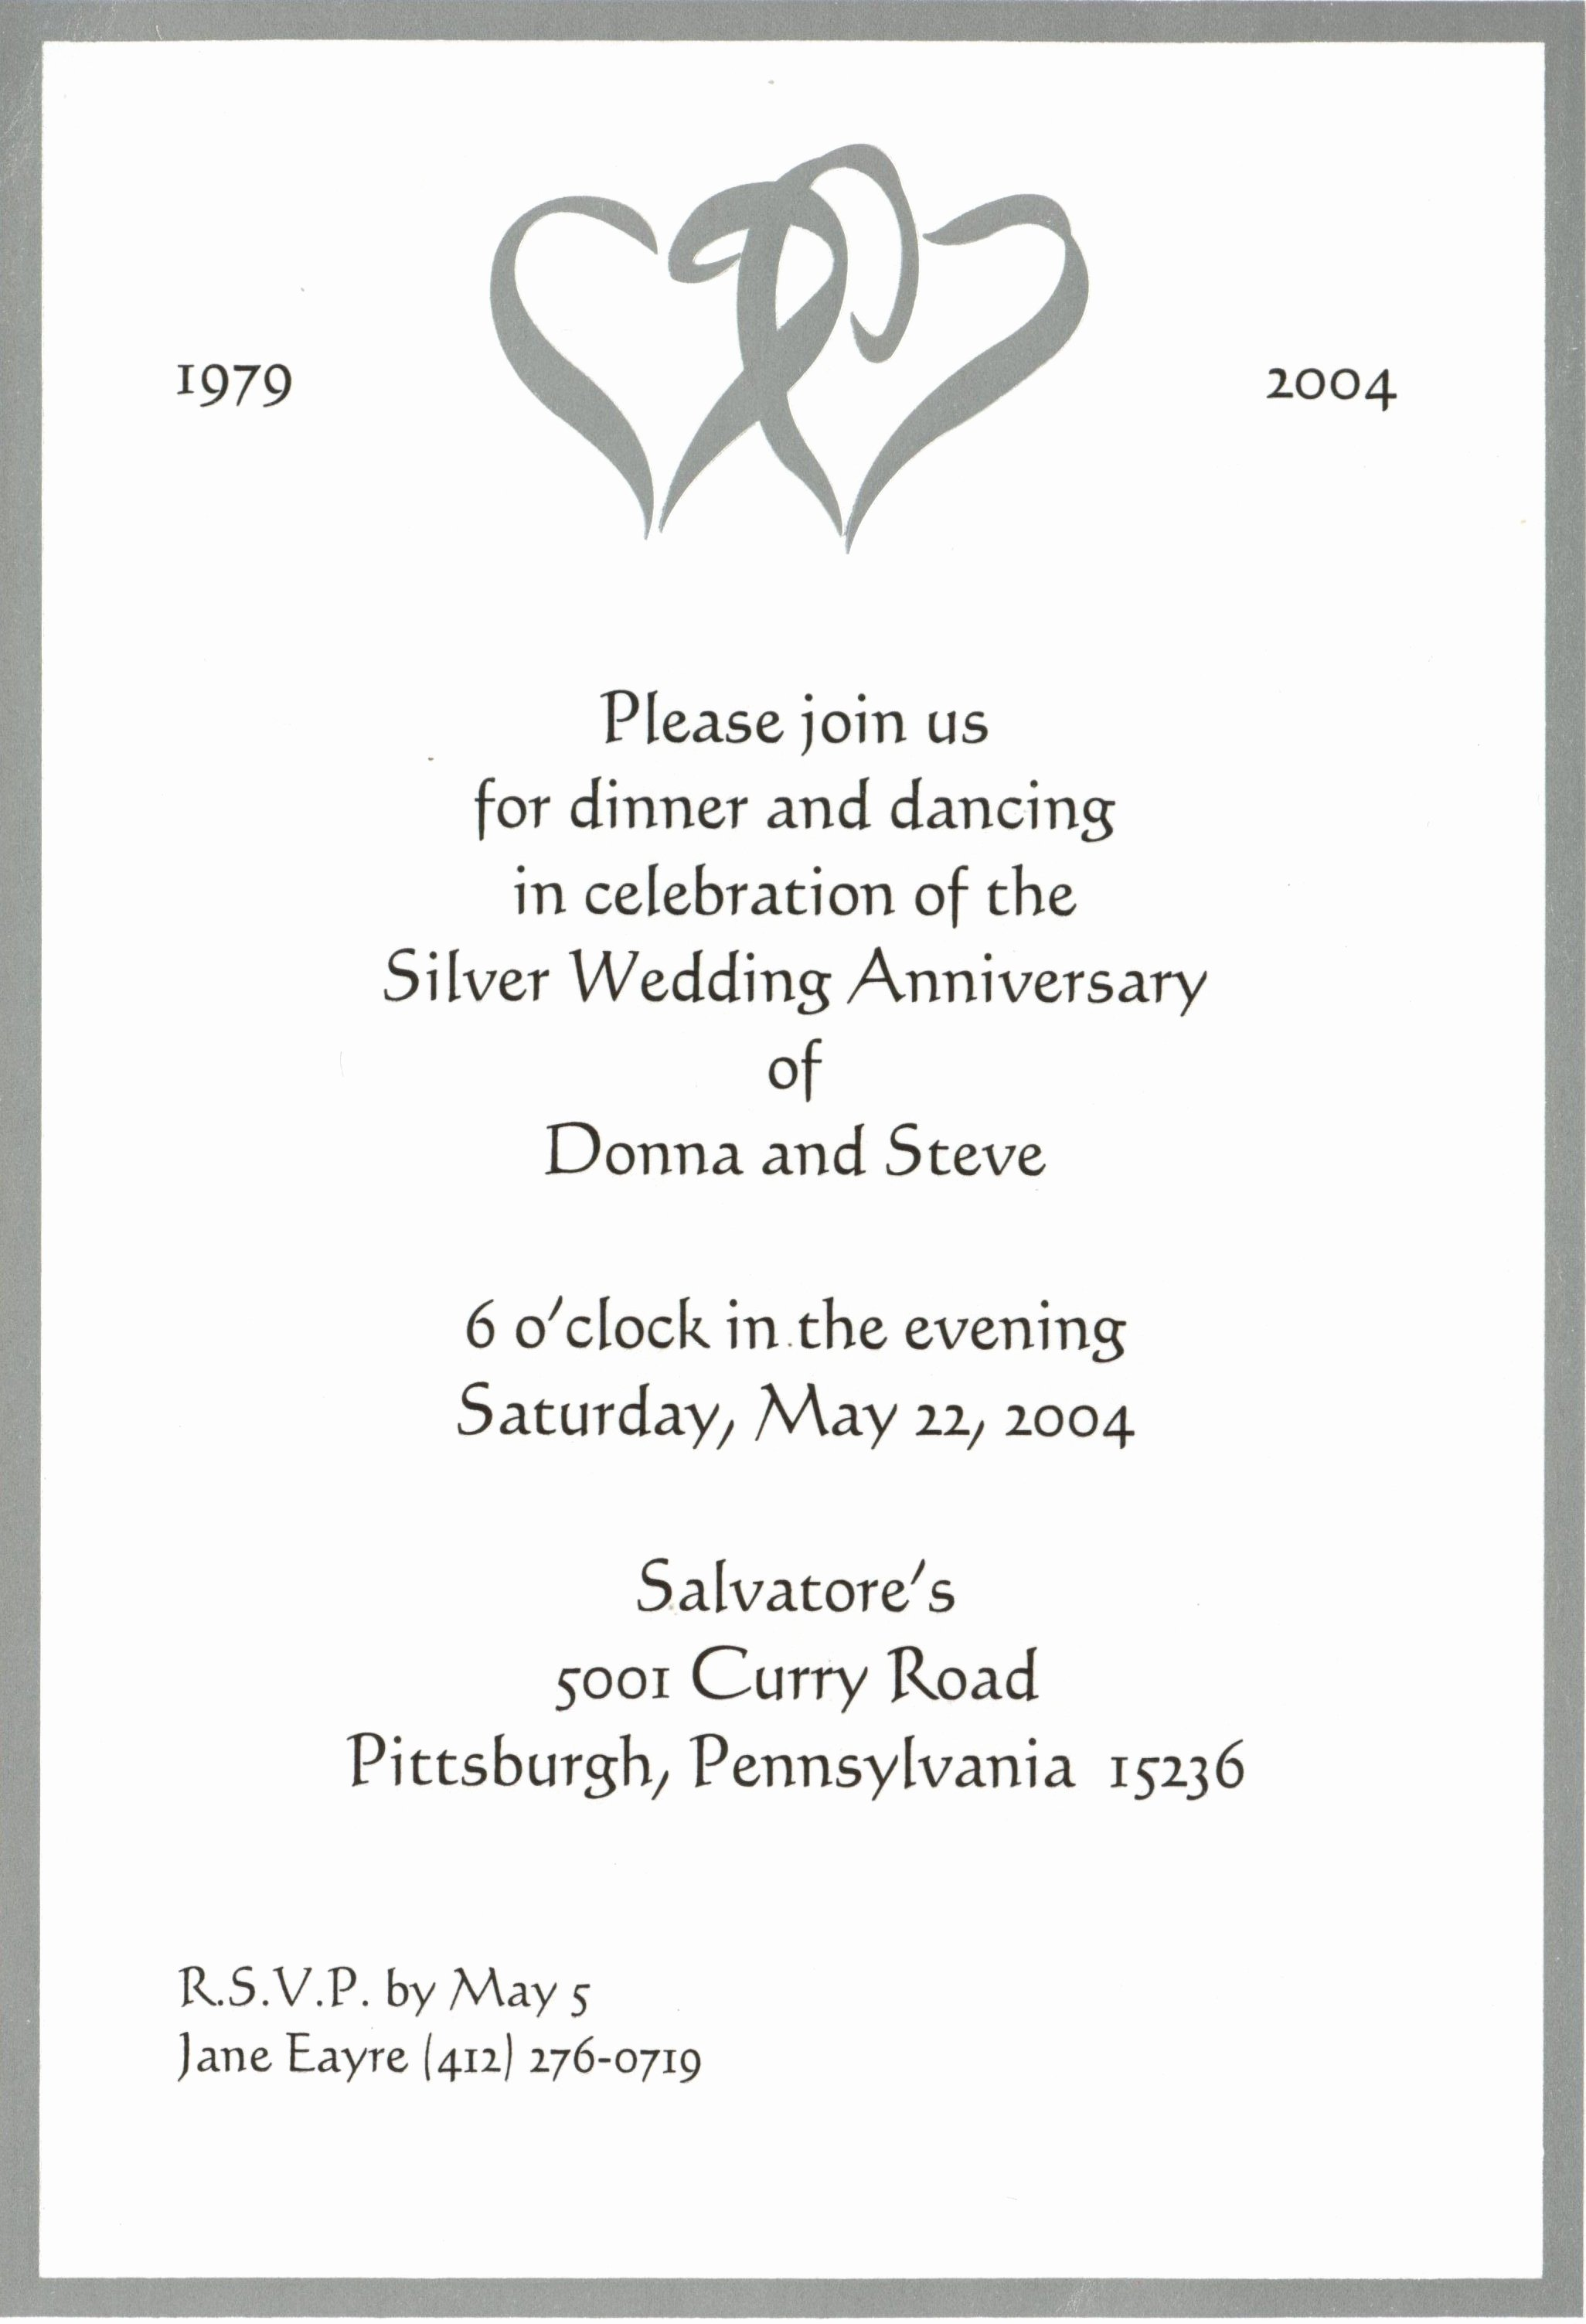 Wedding Anniversary Invite Template Inspirational 50th Wedding Anniversary Invitation Templates Awesome